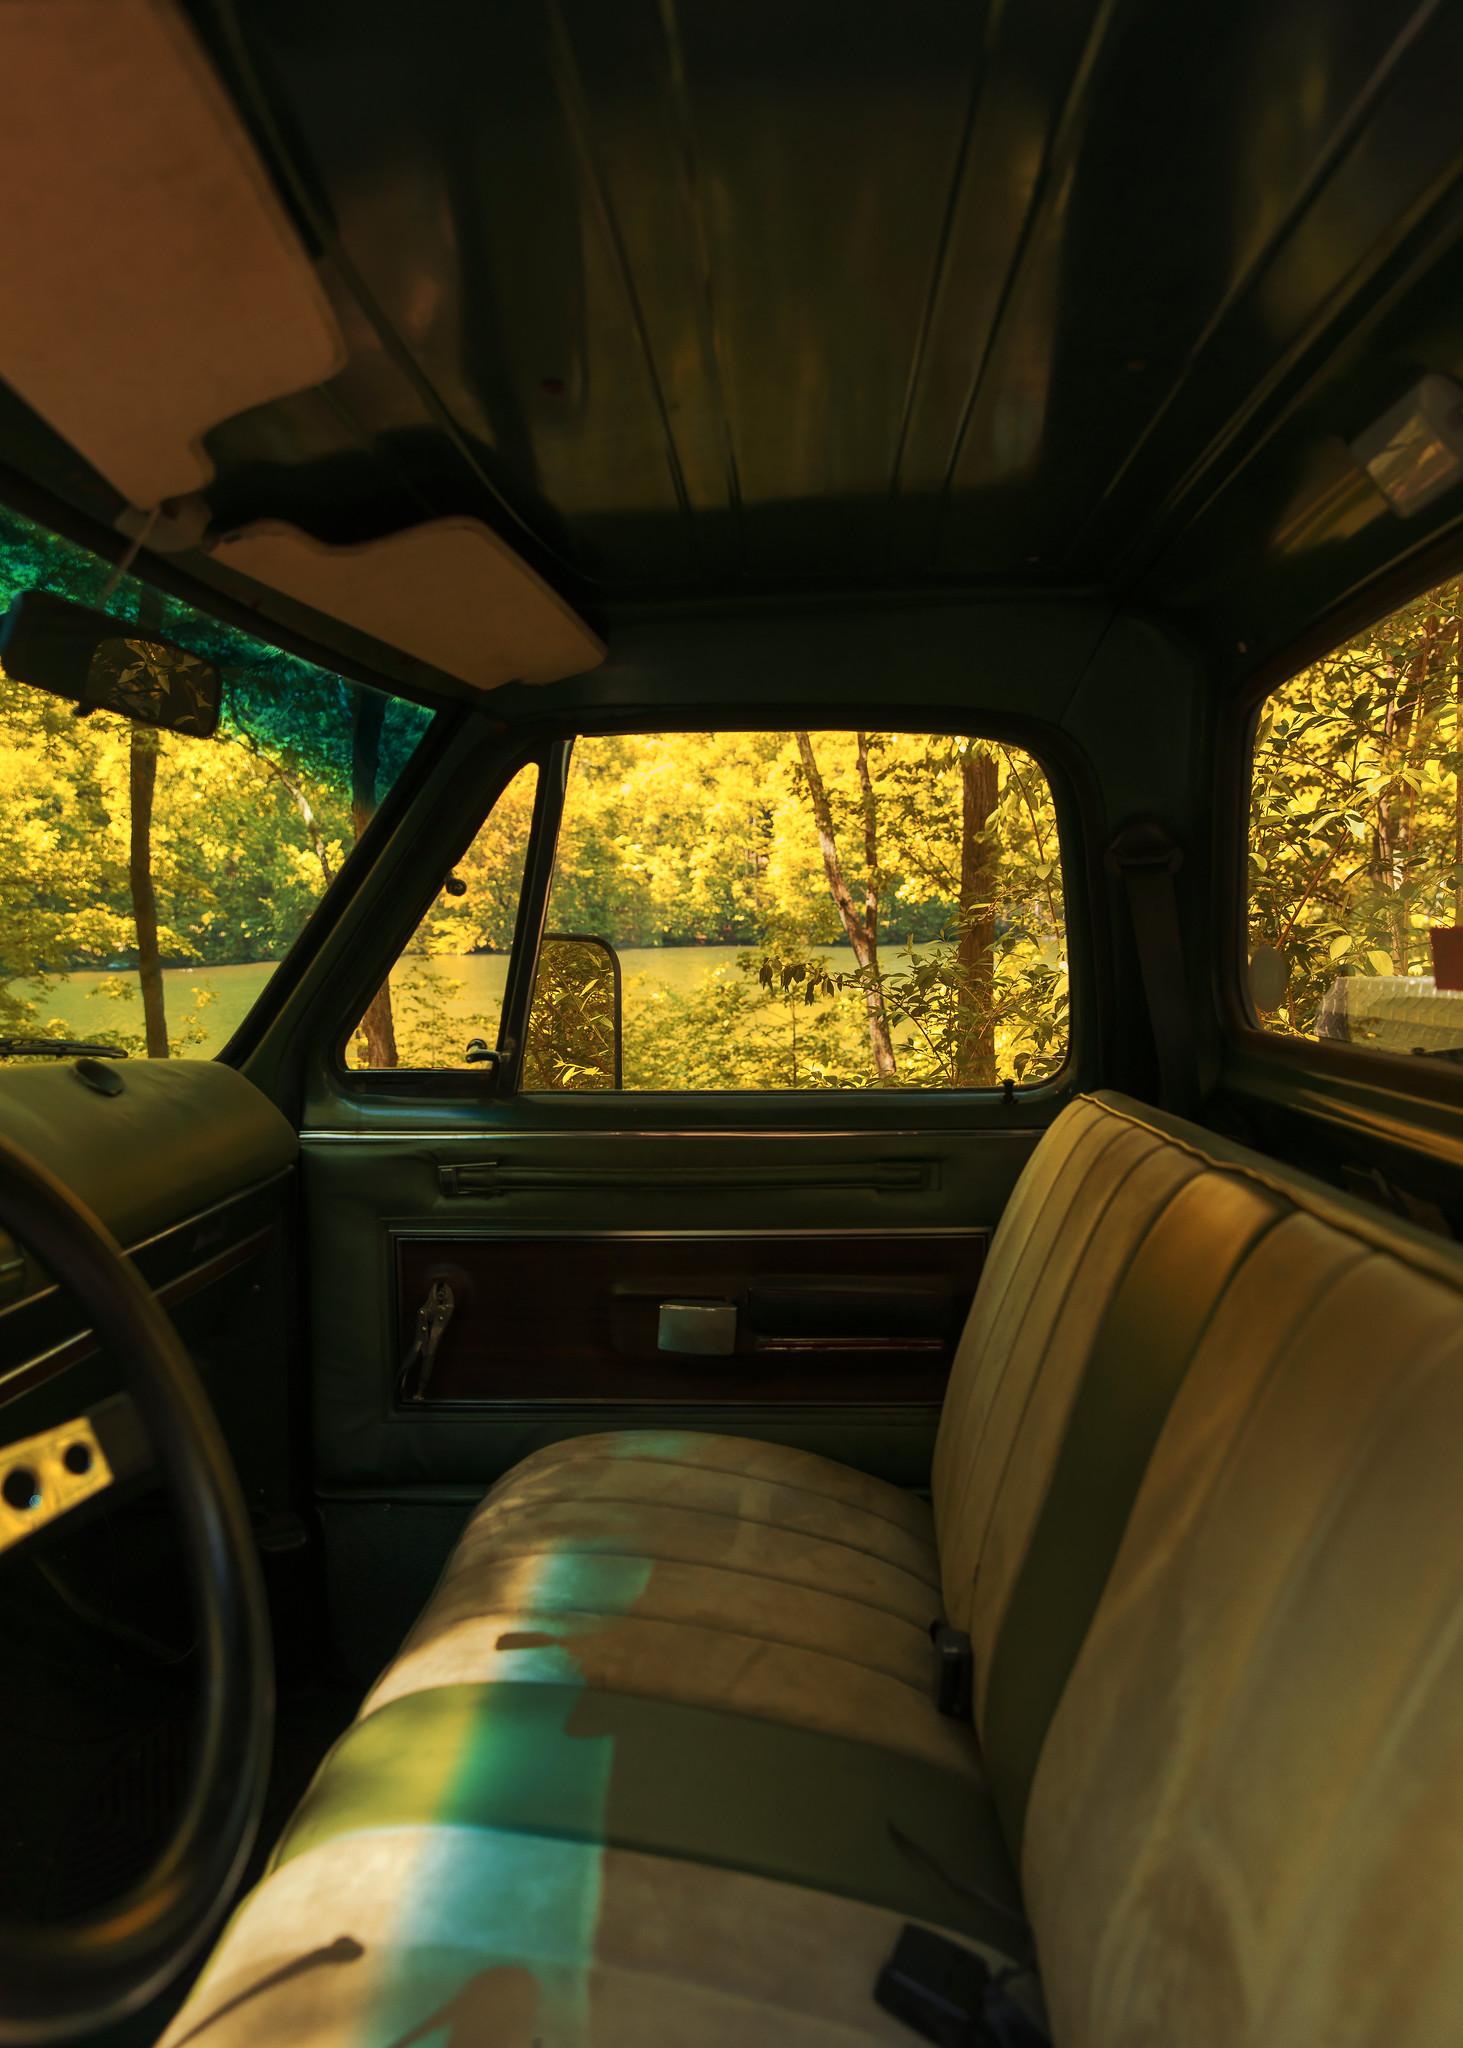 TruckWindowWoods.jpg